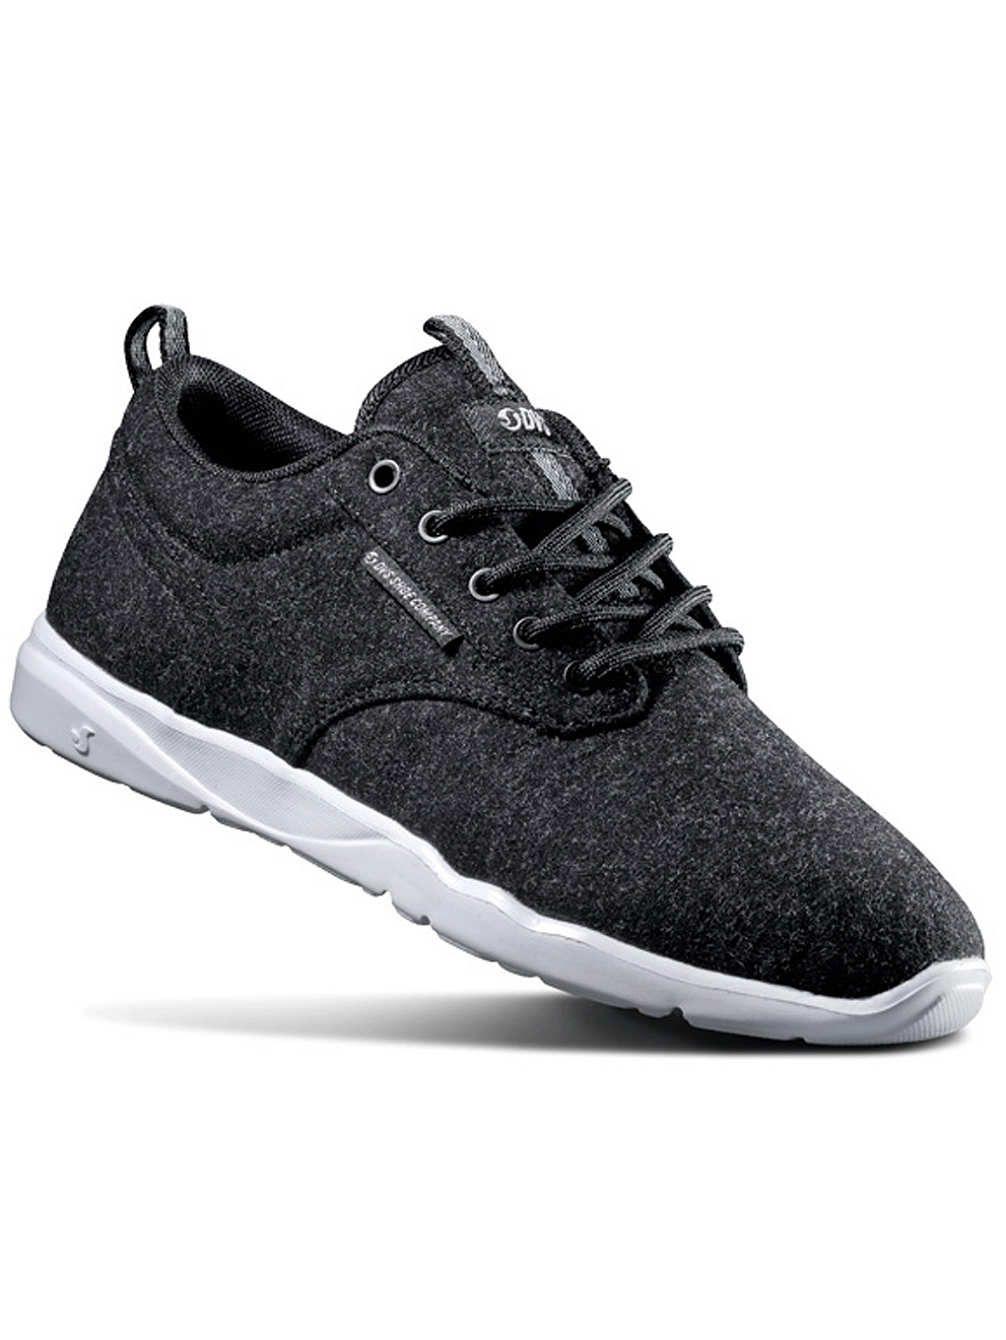 http://www.blue-tomato.com/fr-FR/product/DVS-Premier 2 0 Sneakers-302303871-black pressed wool/